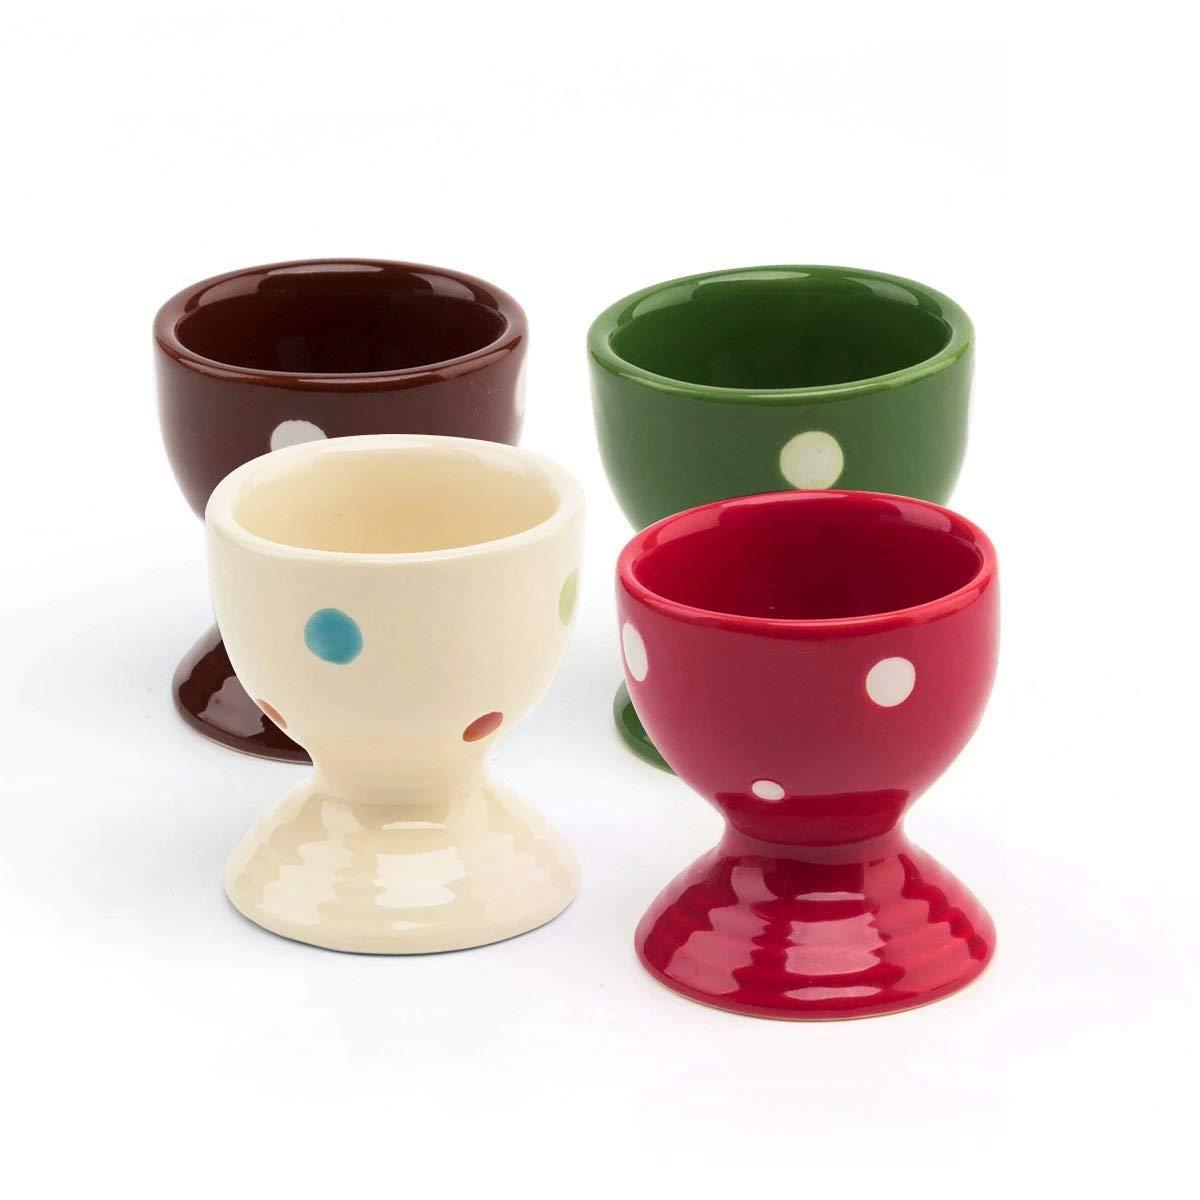 Lofekea Egg Cups Set of Four Ceramic Polka Dot Egg Cups Porcelain Egg Holders Gifts for Kitchen